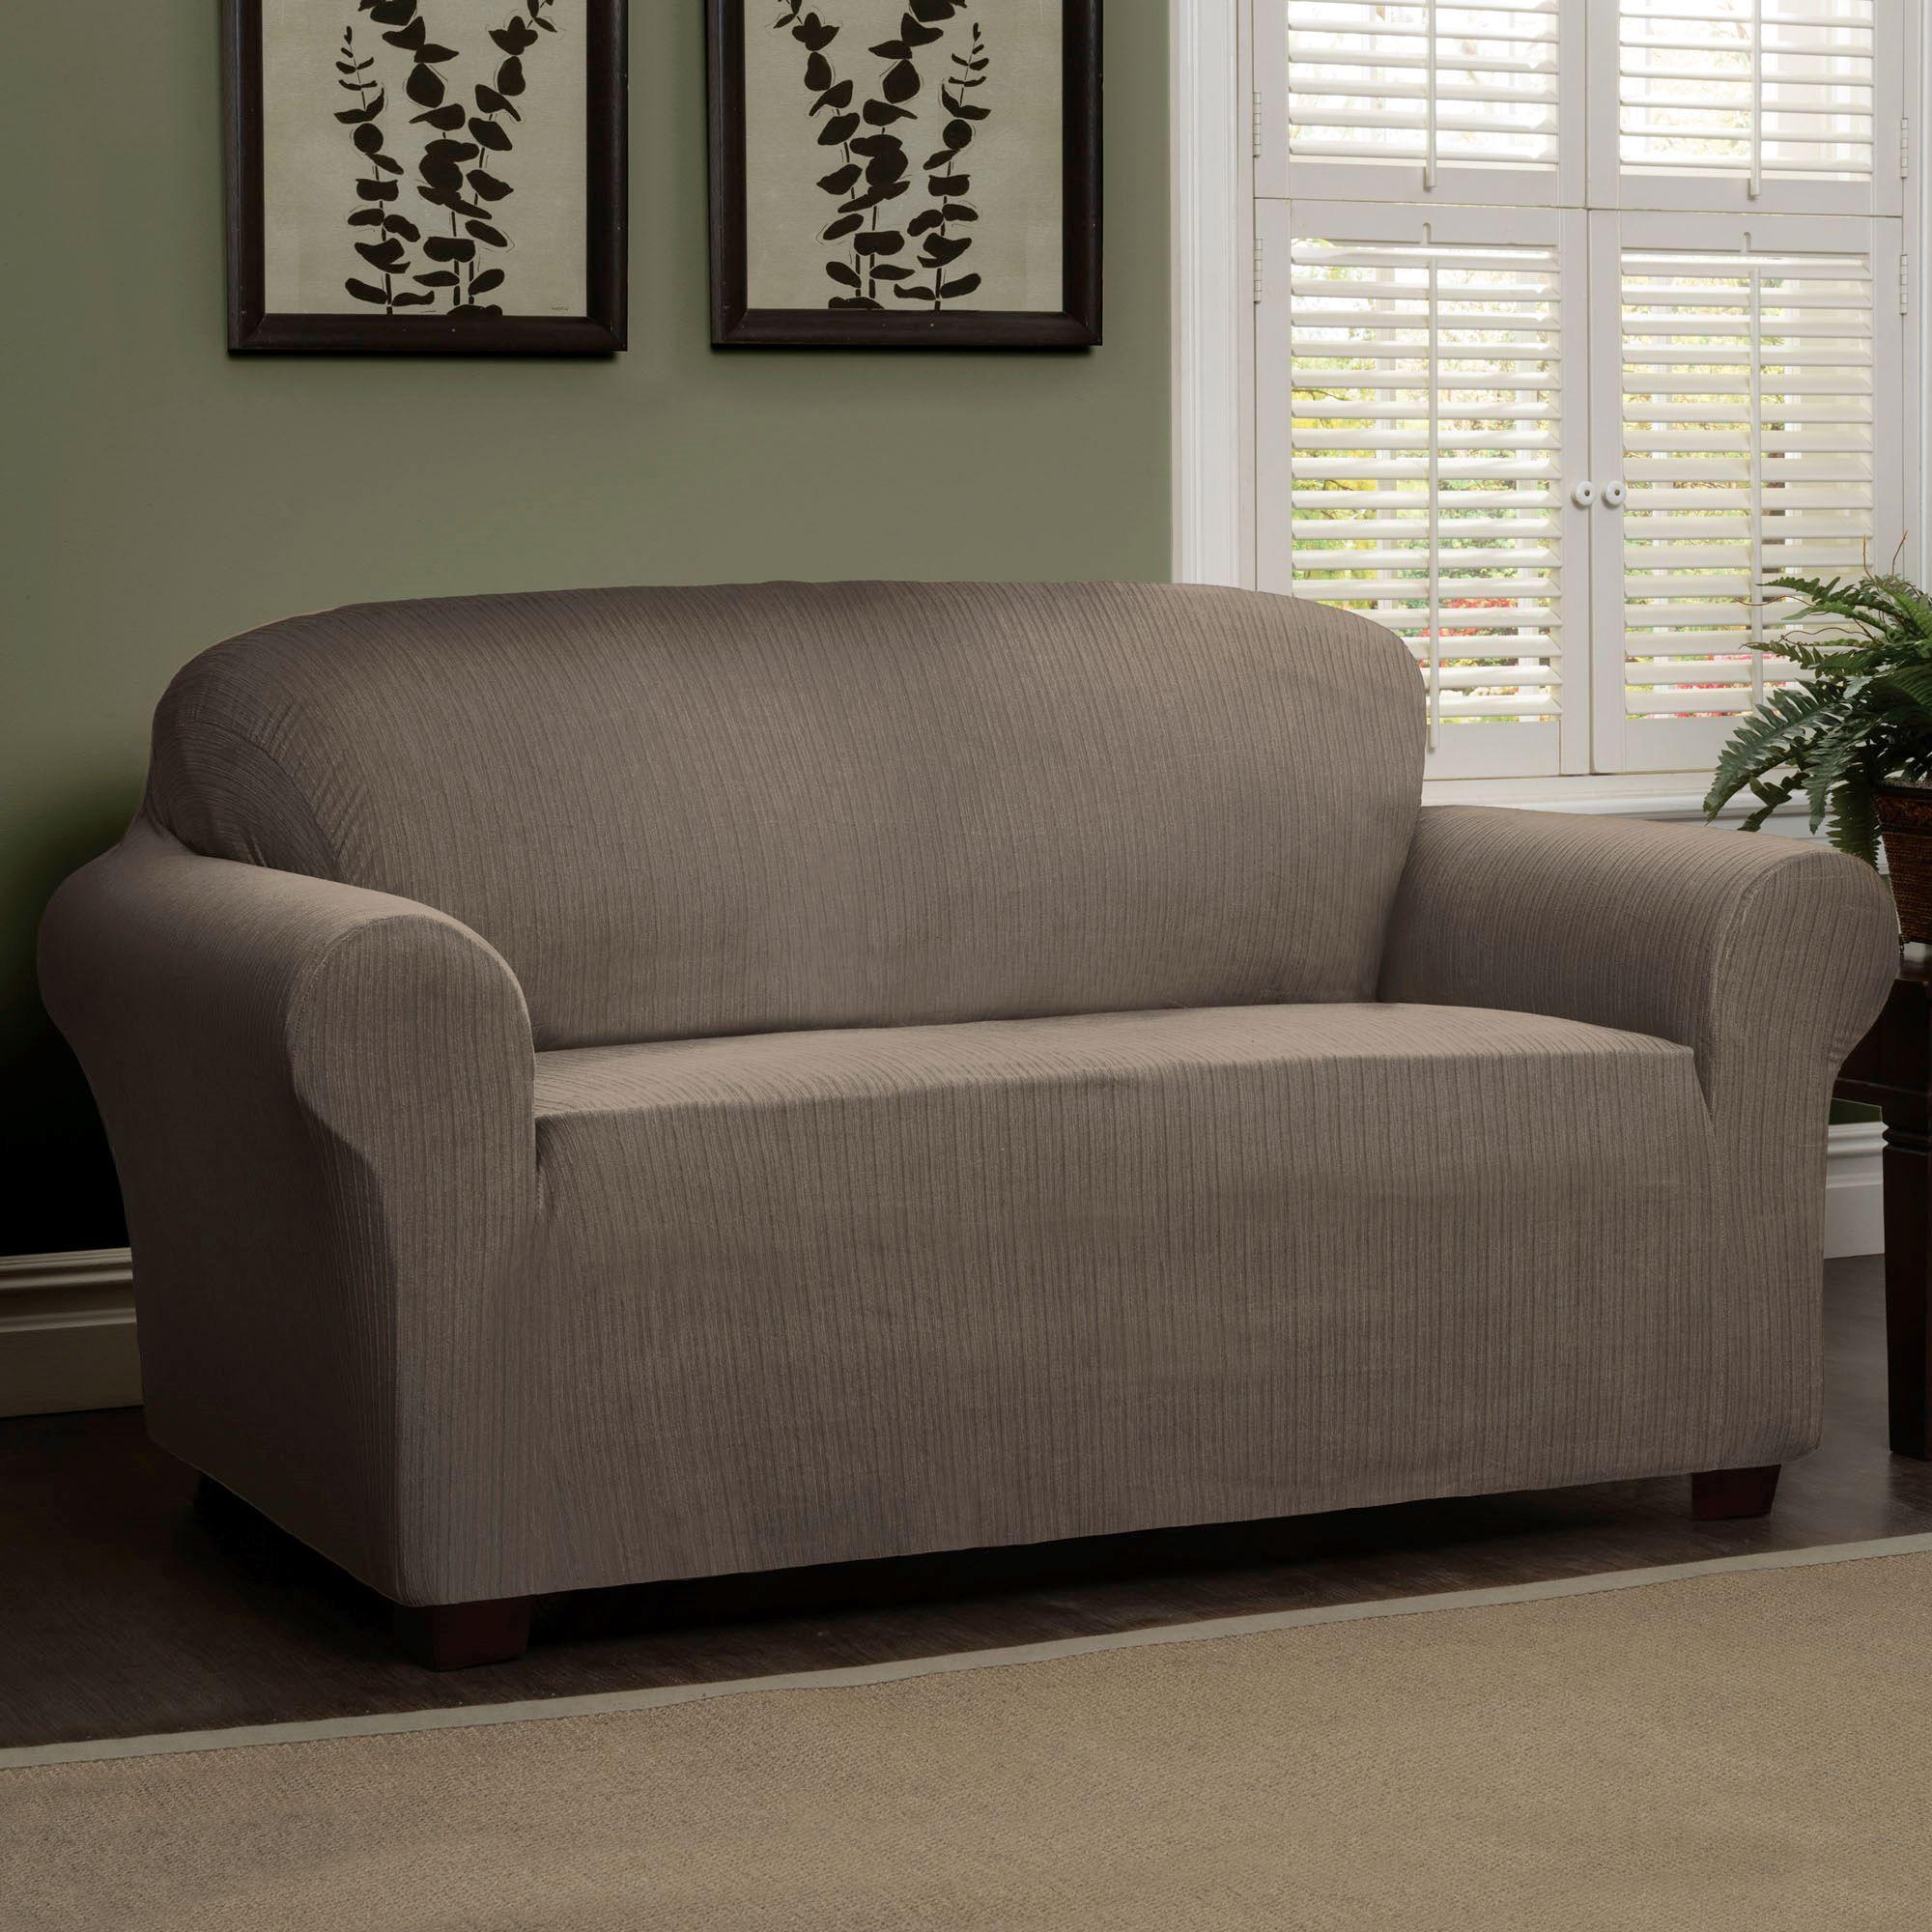 Brodie Stretch Furniture Slipcovers